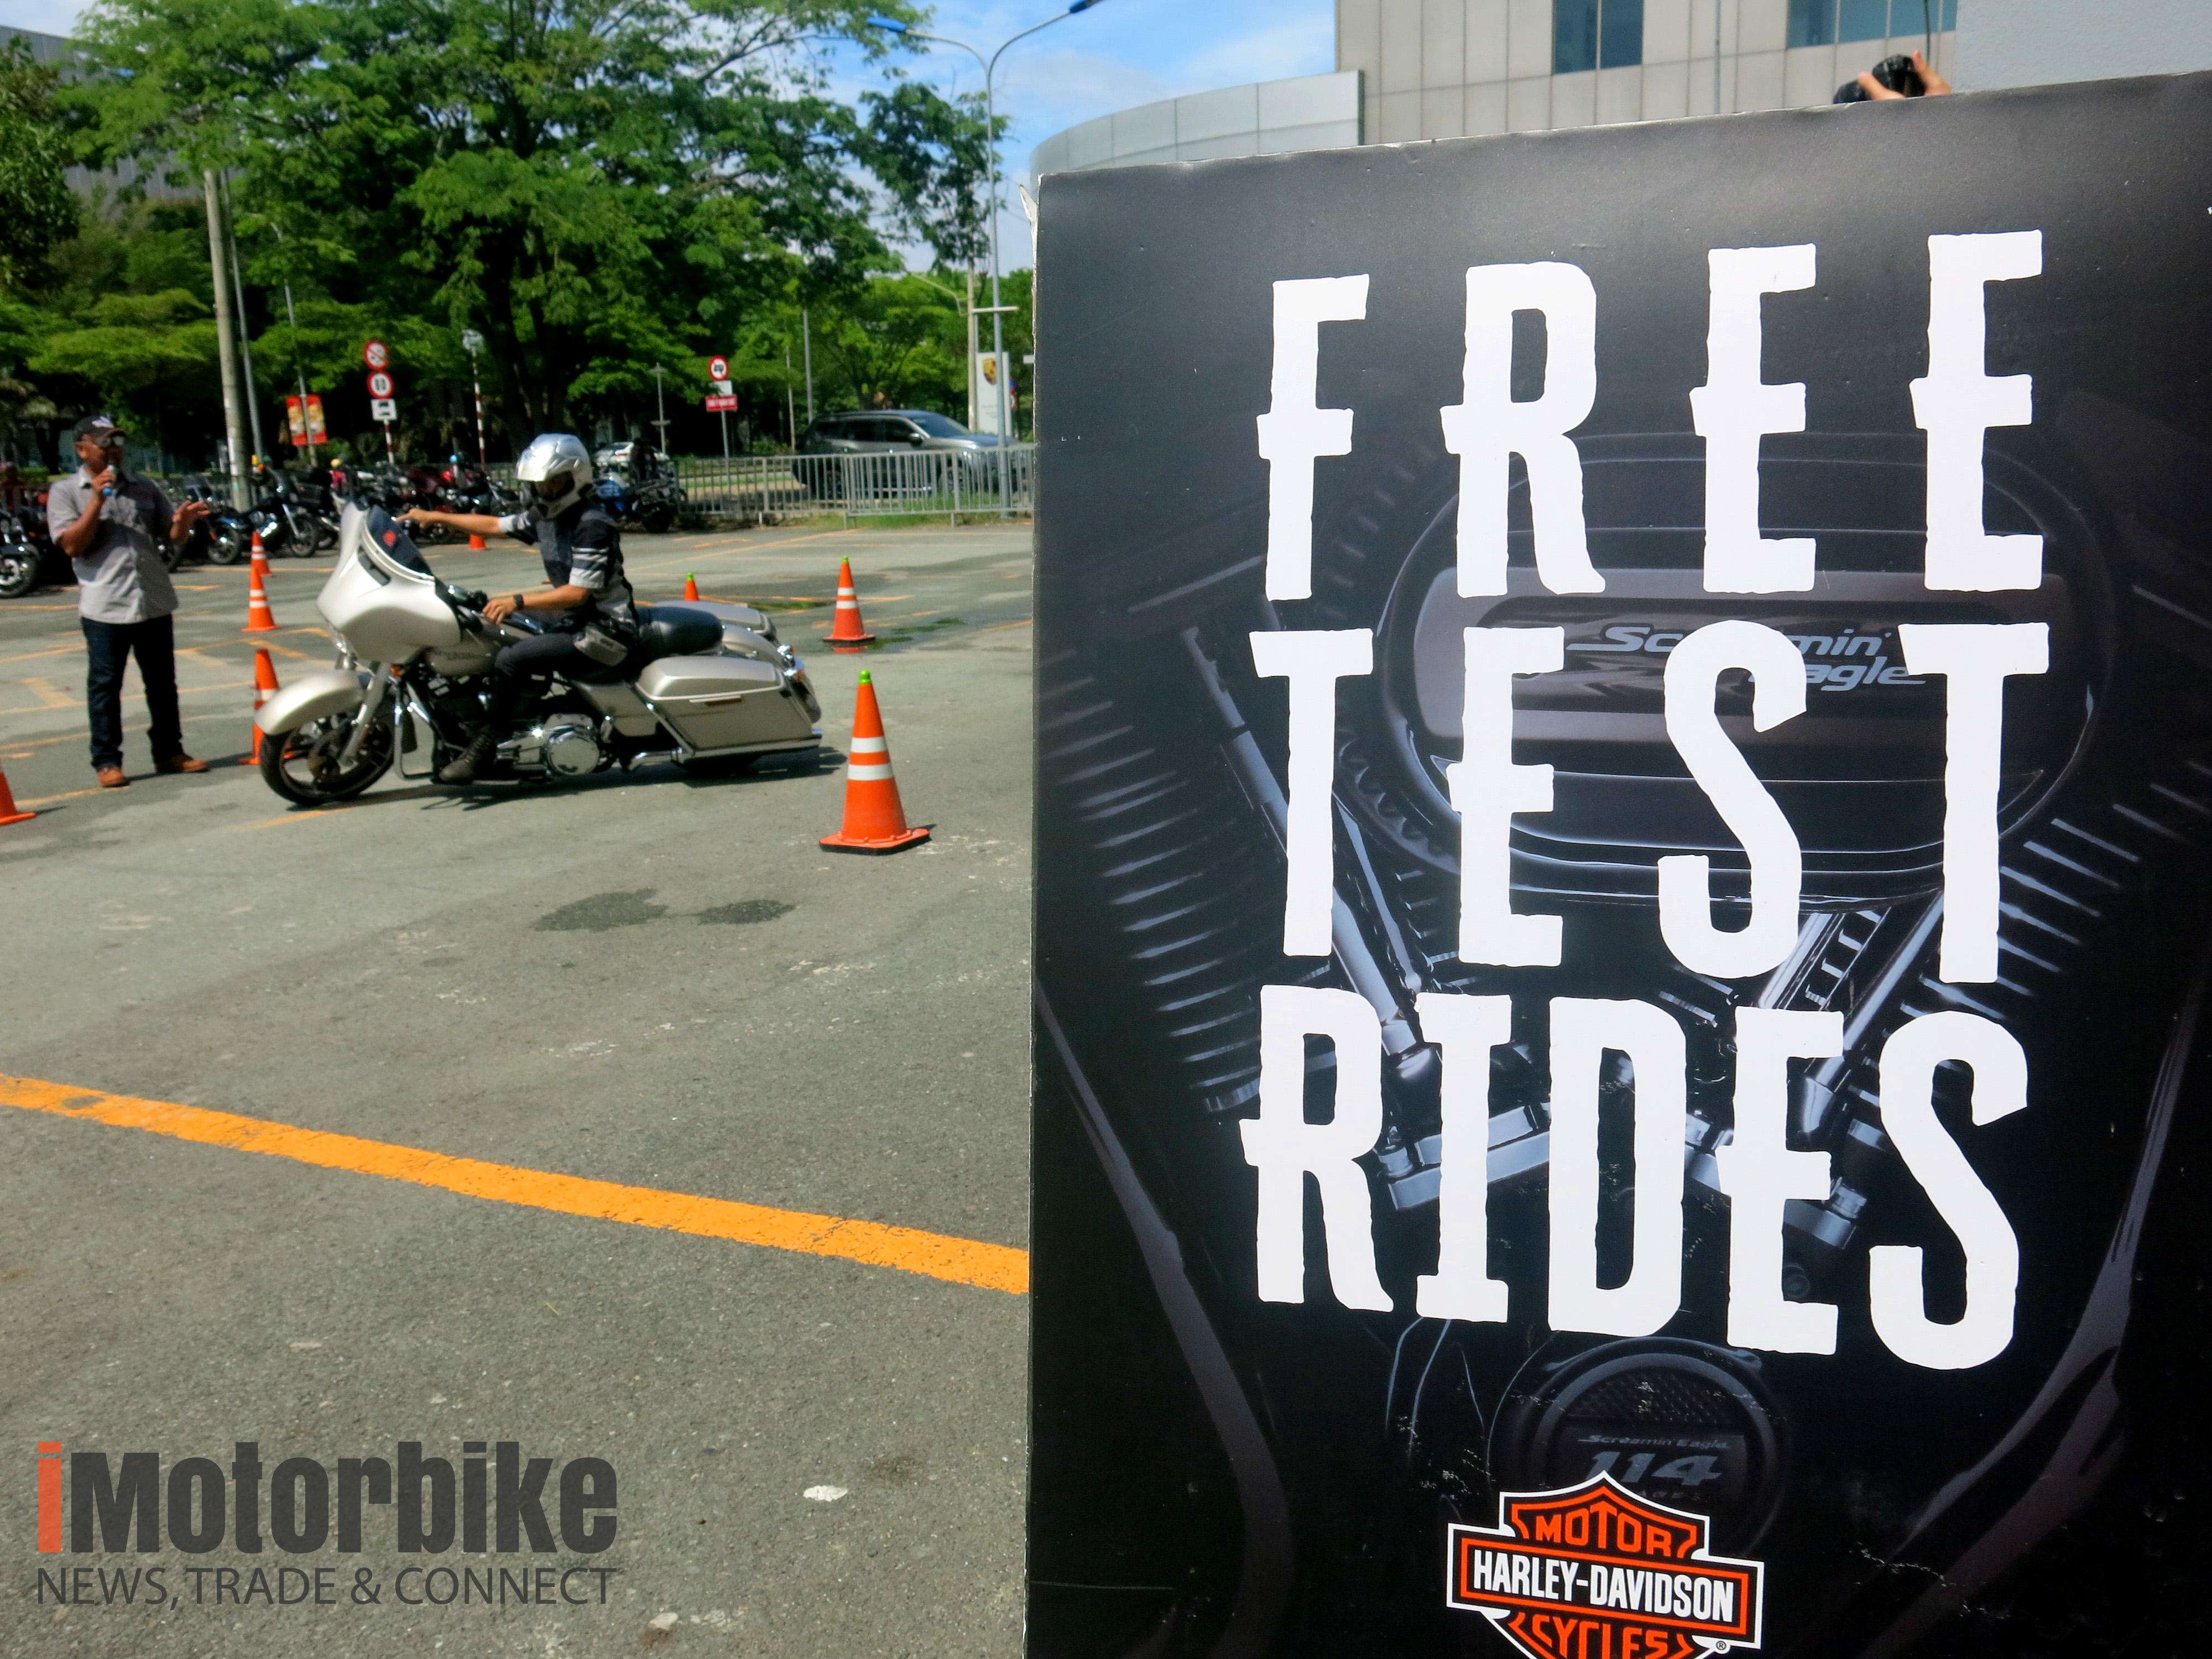 [Summer Tour] Pre-tour Meeting cùng Harley-Davidson Saigon trước giờ G